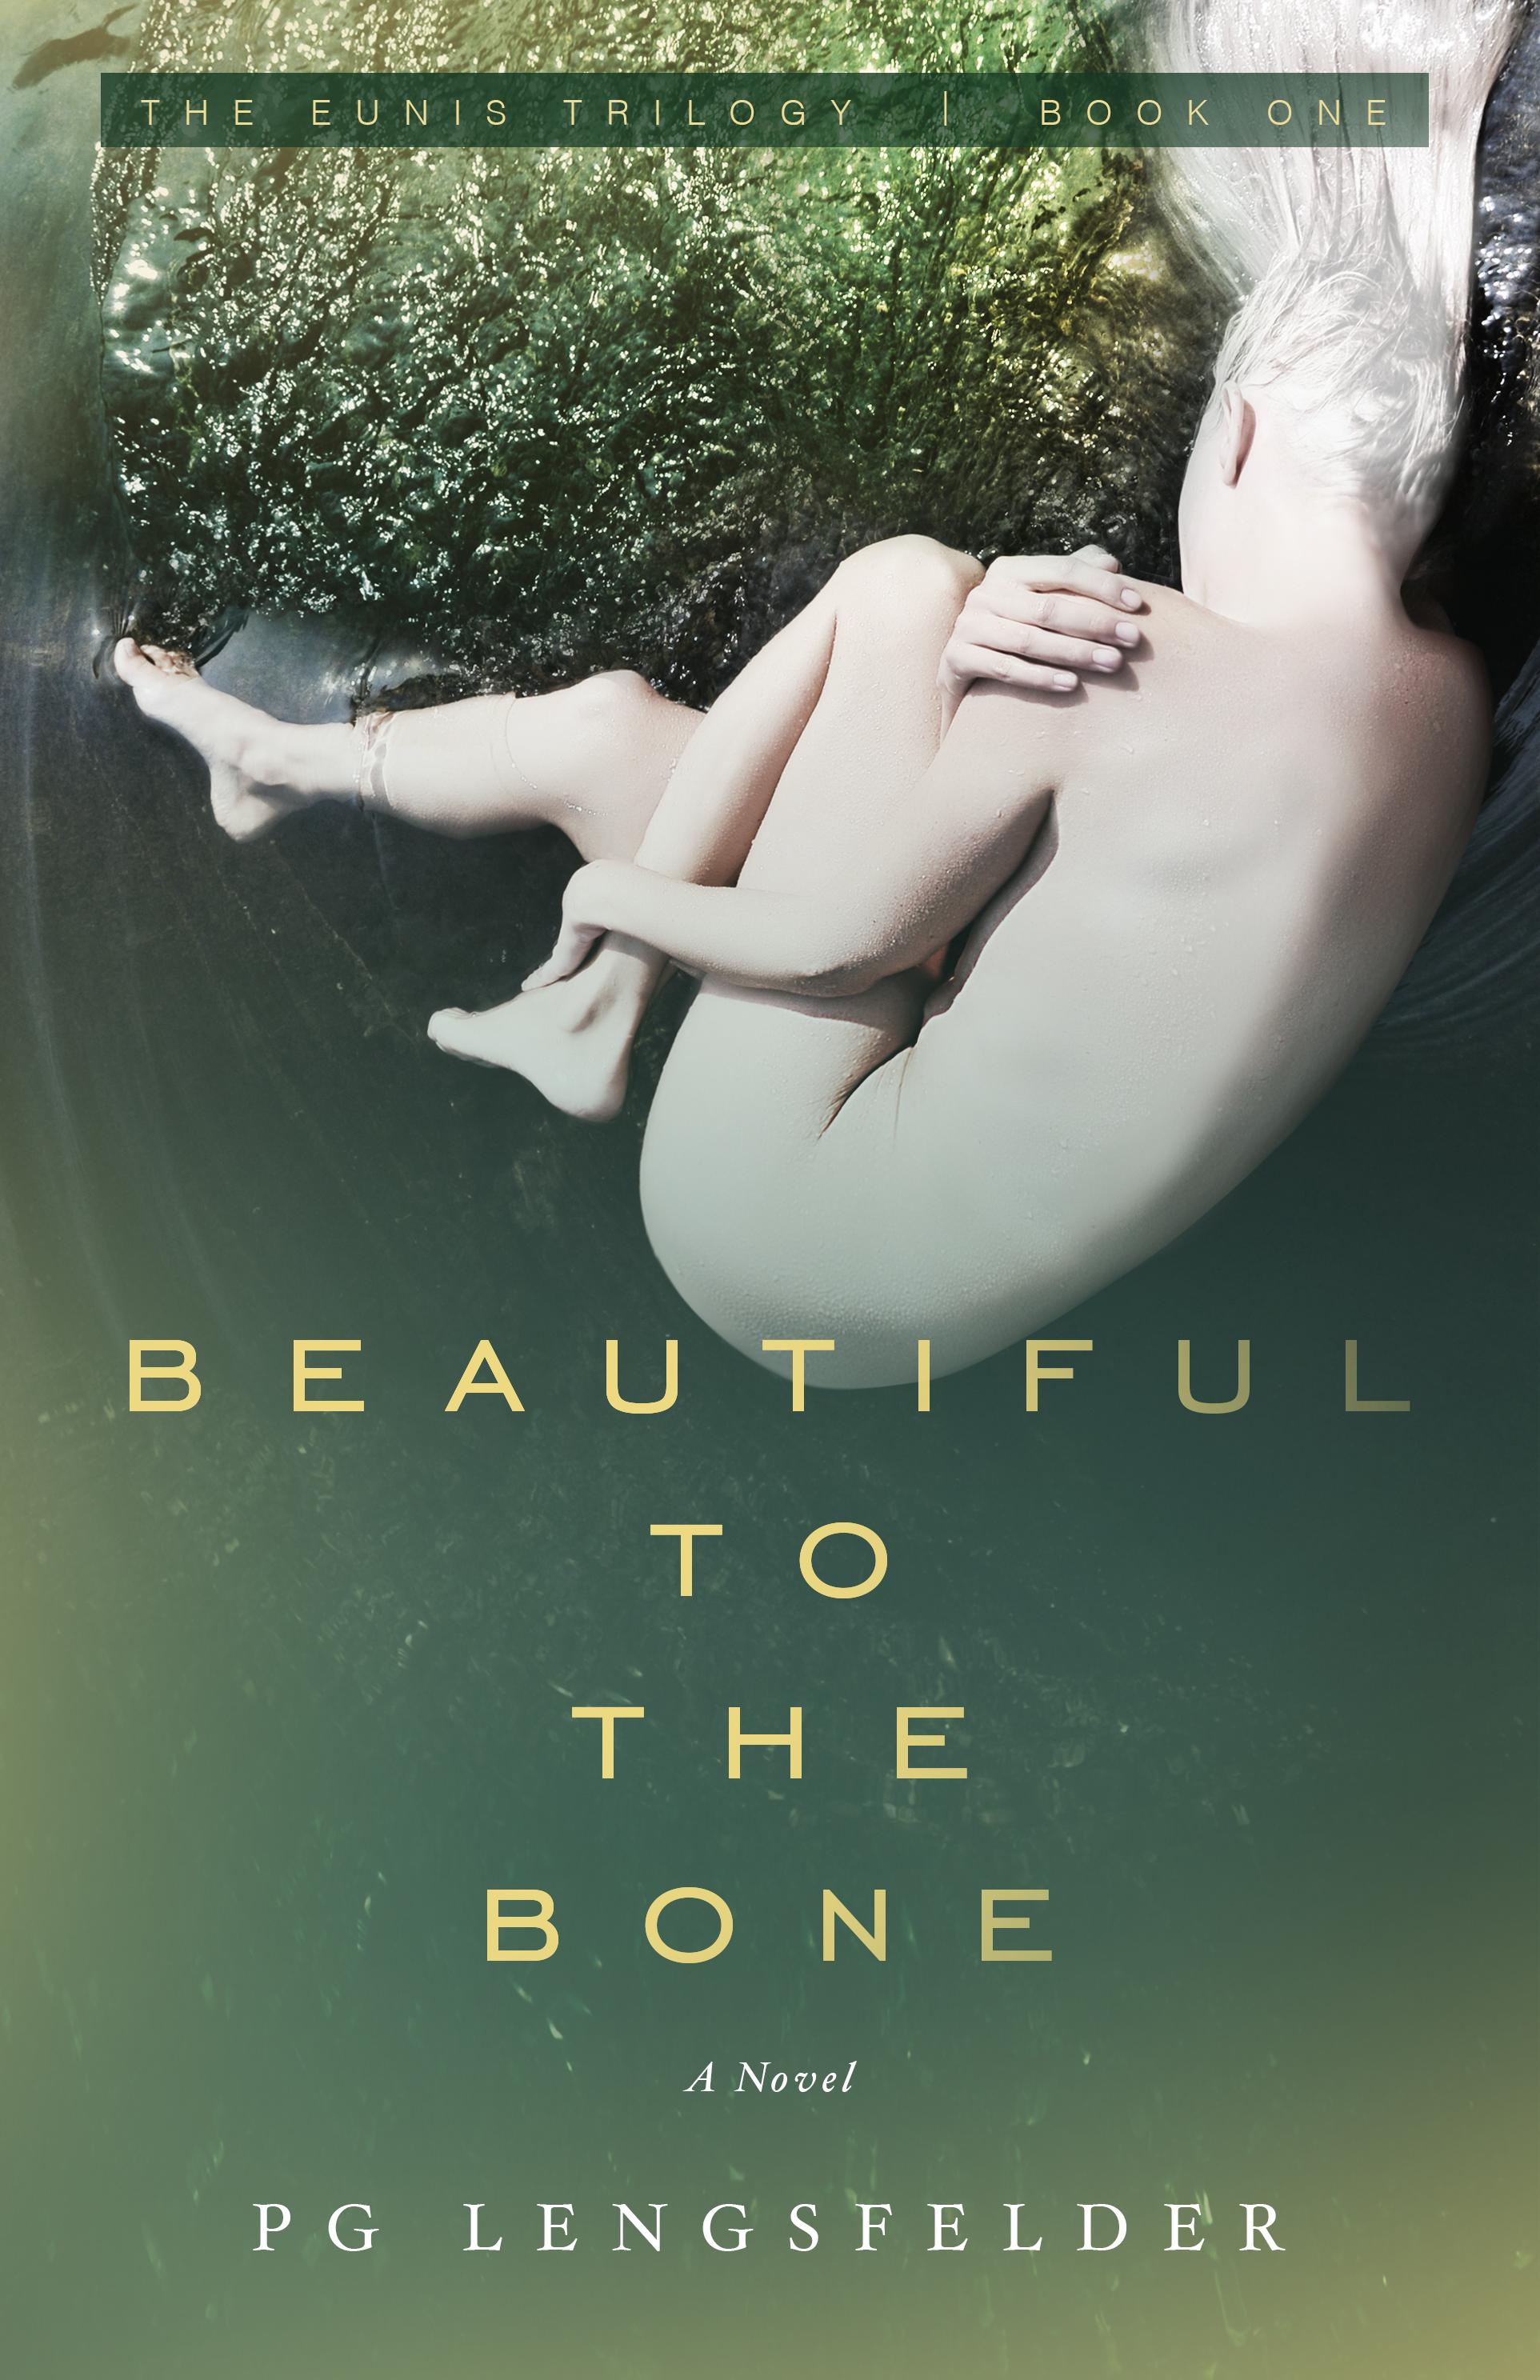 BeautifulToTheBone_FINAL_COVER_2.17.16.jpg